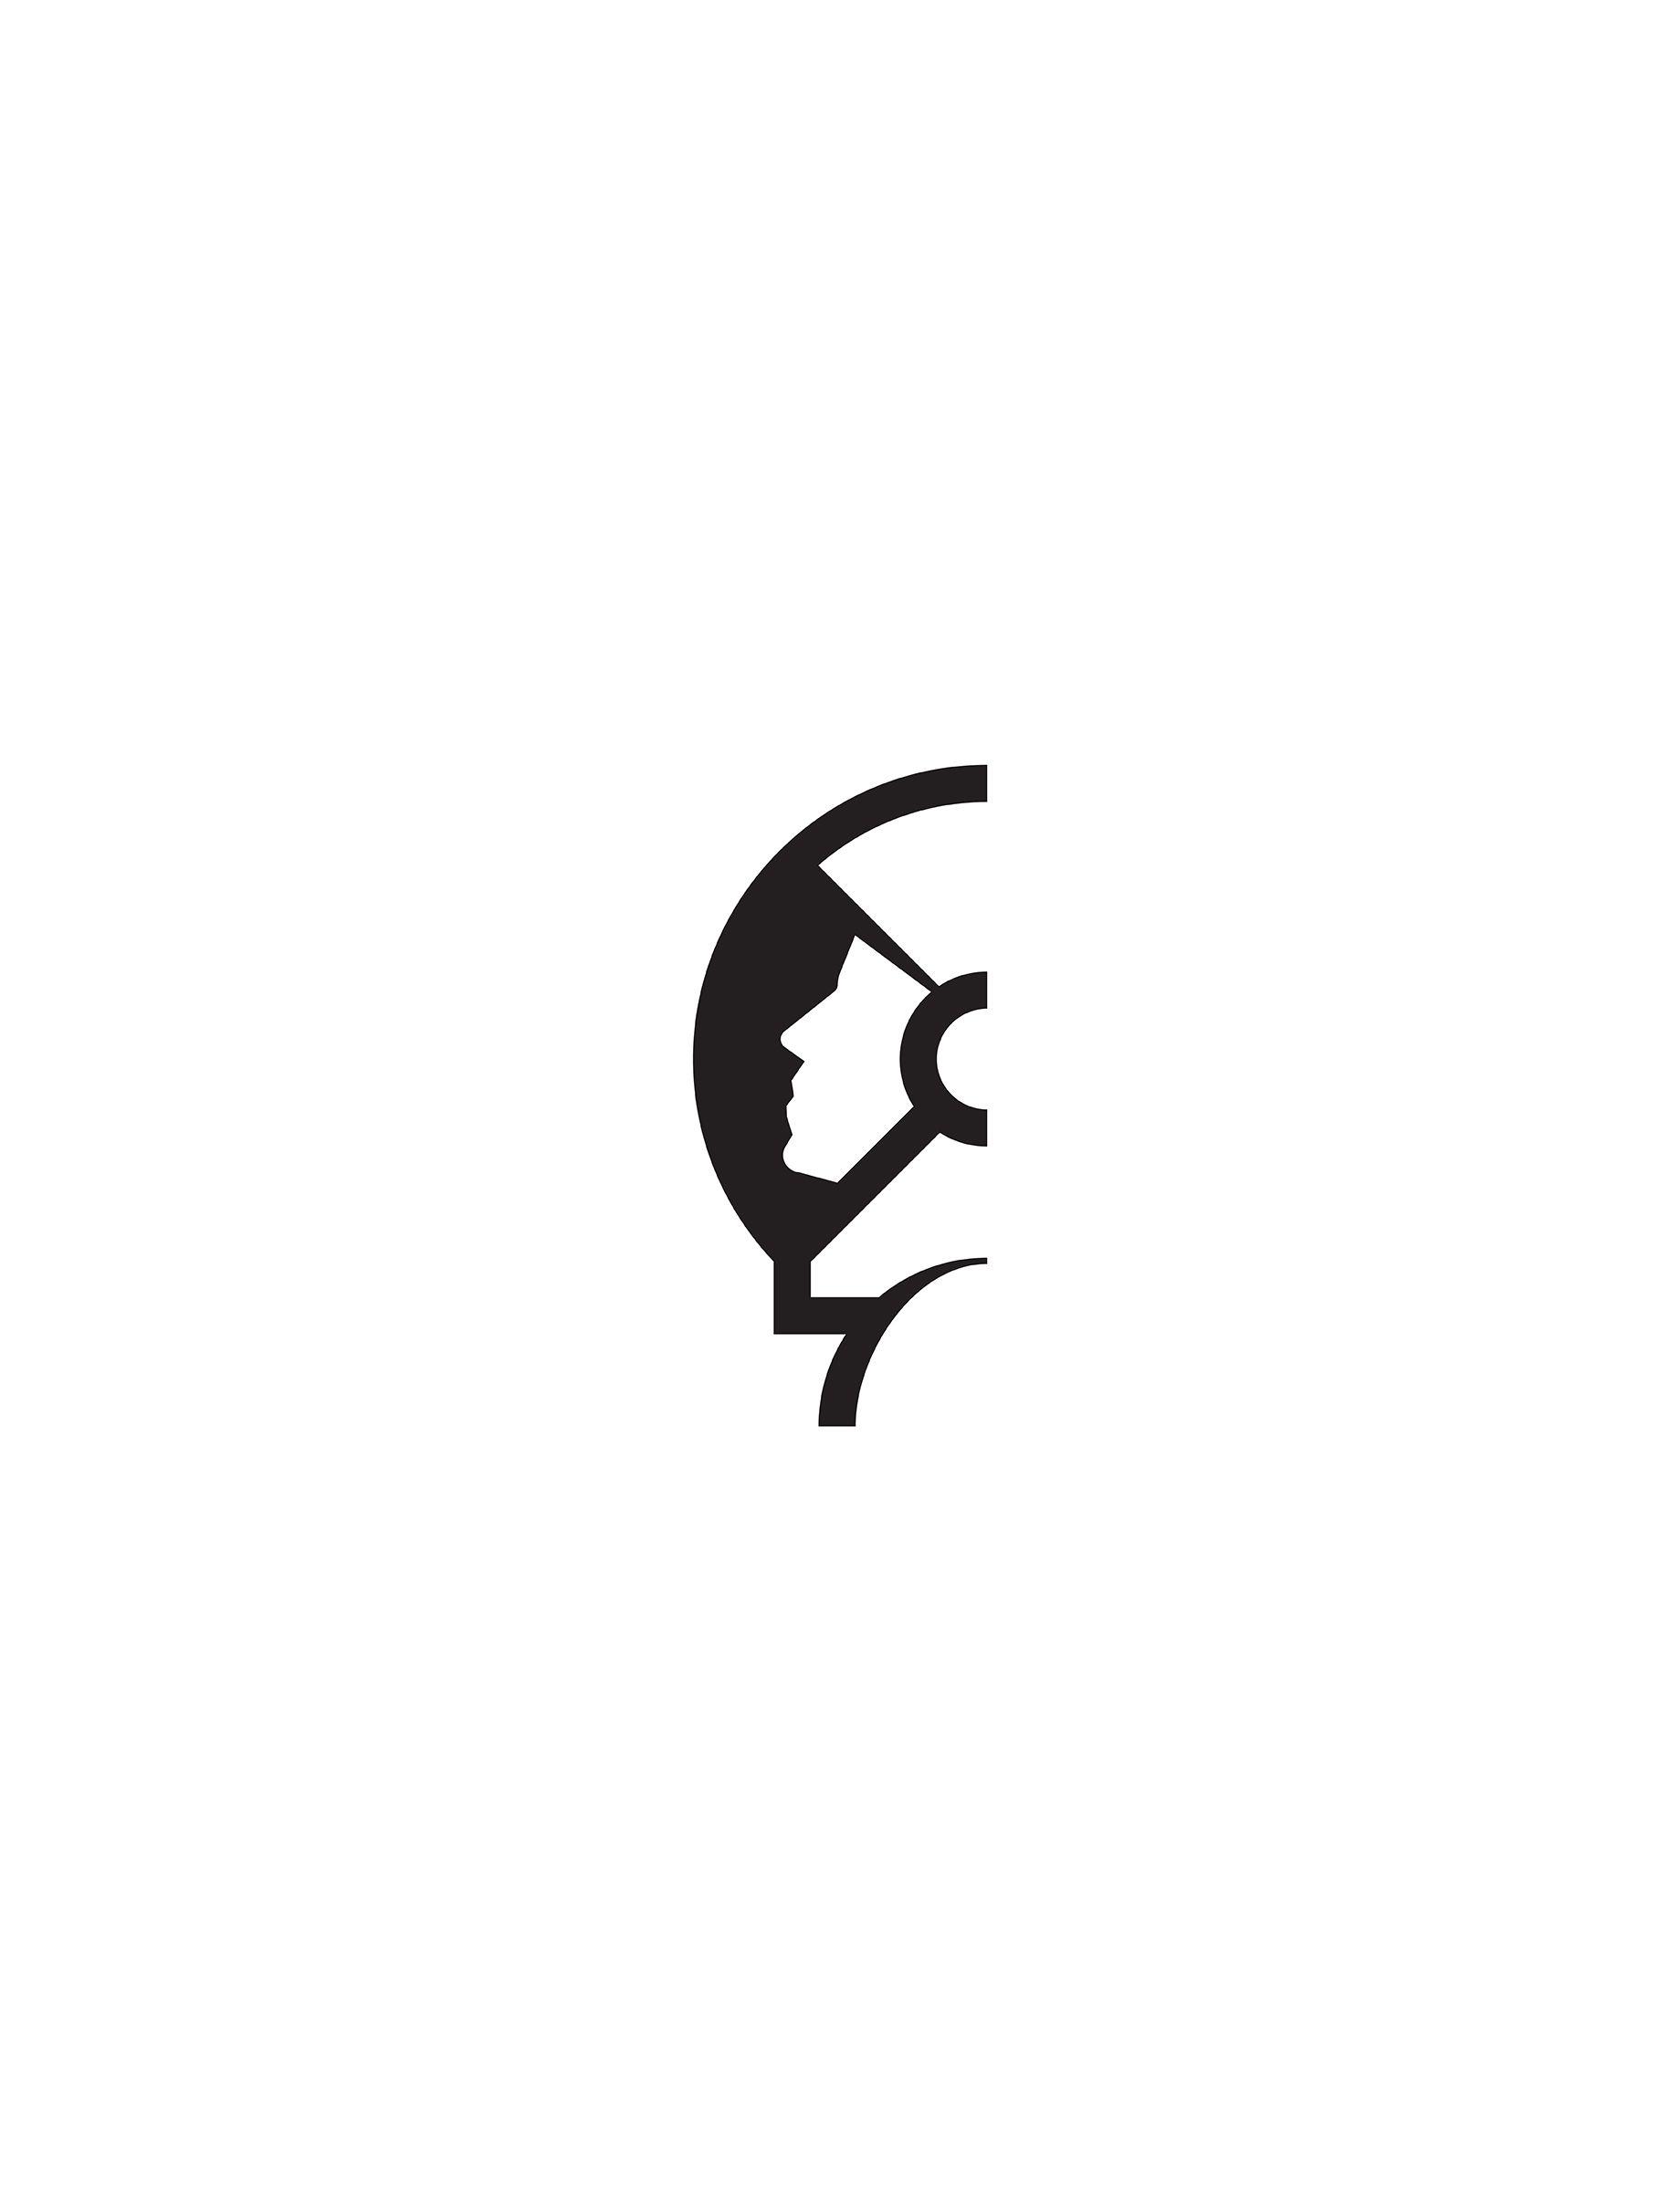 Logos_monogramas_crop2-05 http://jrstudioweb.com/diseno-grafico/diseno-de-logotipos/